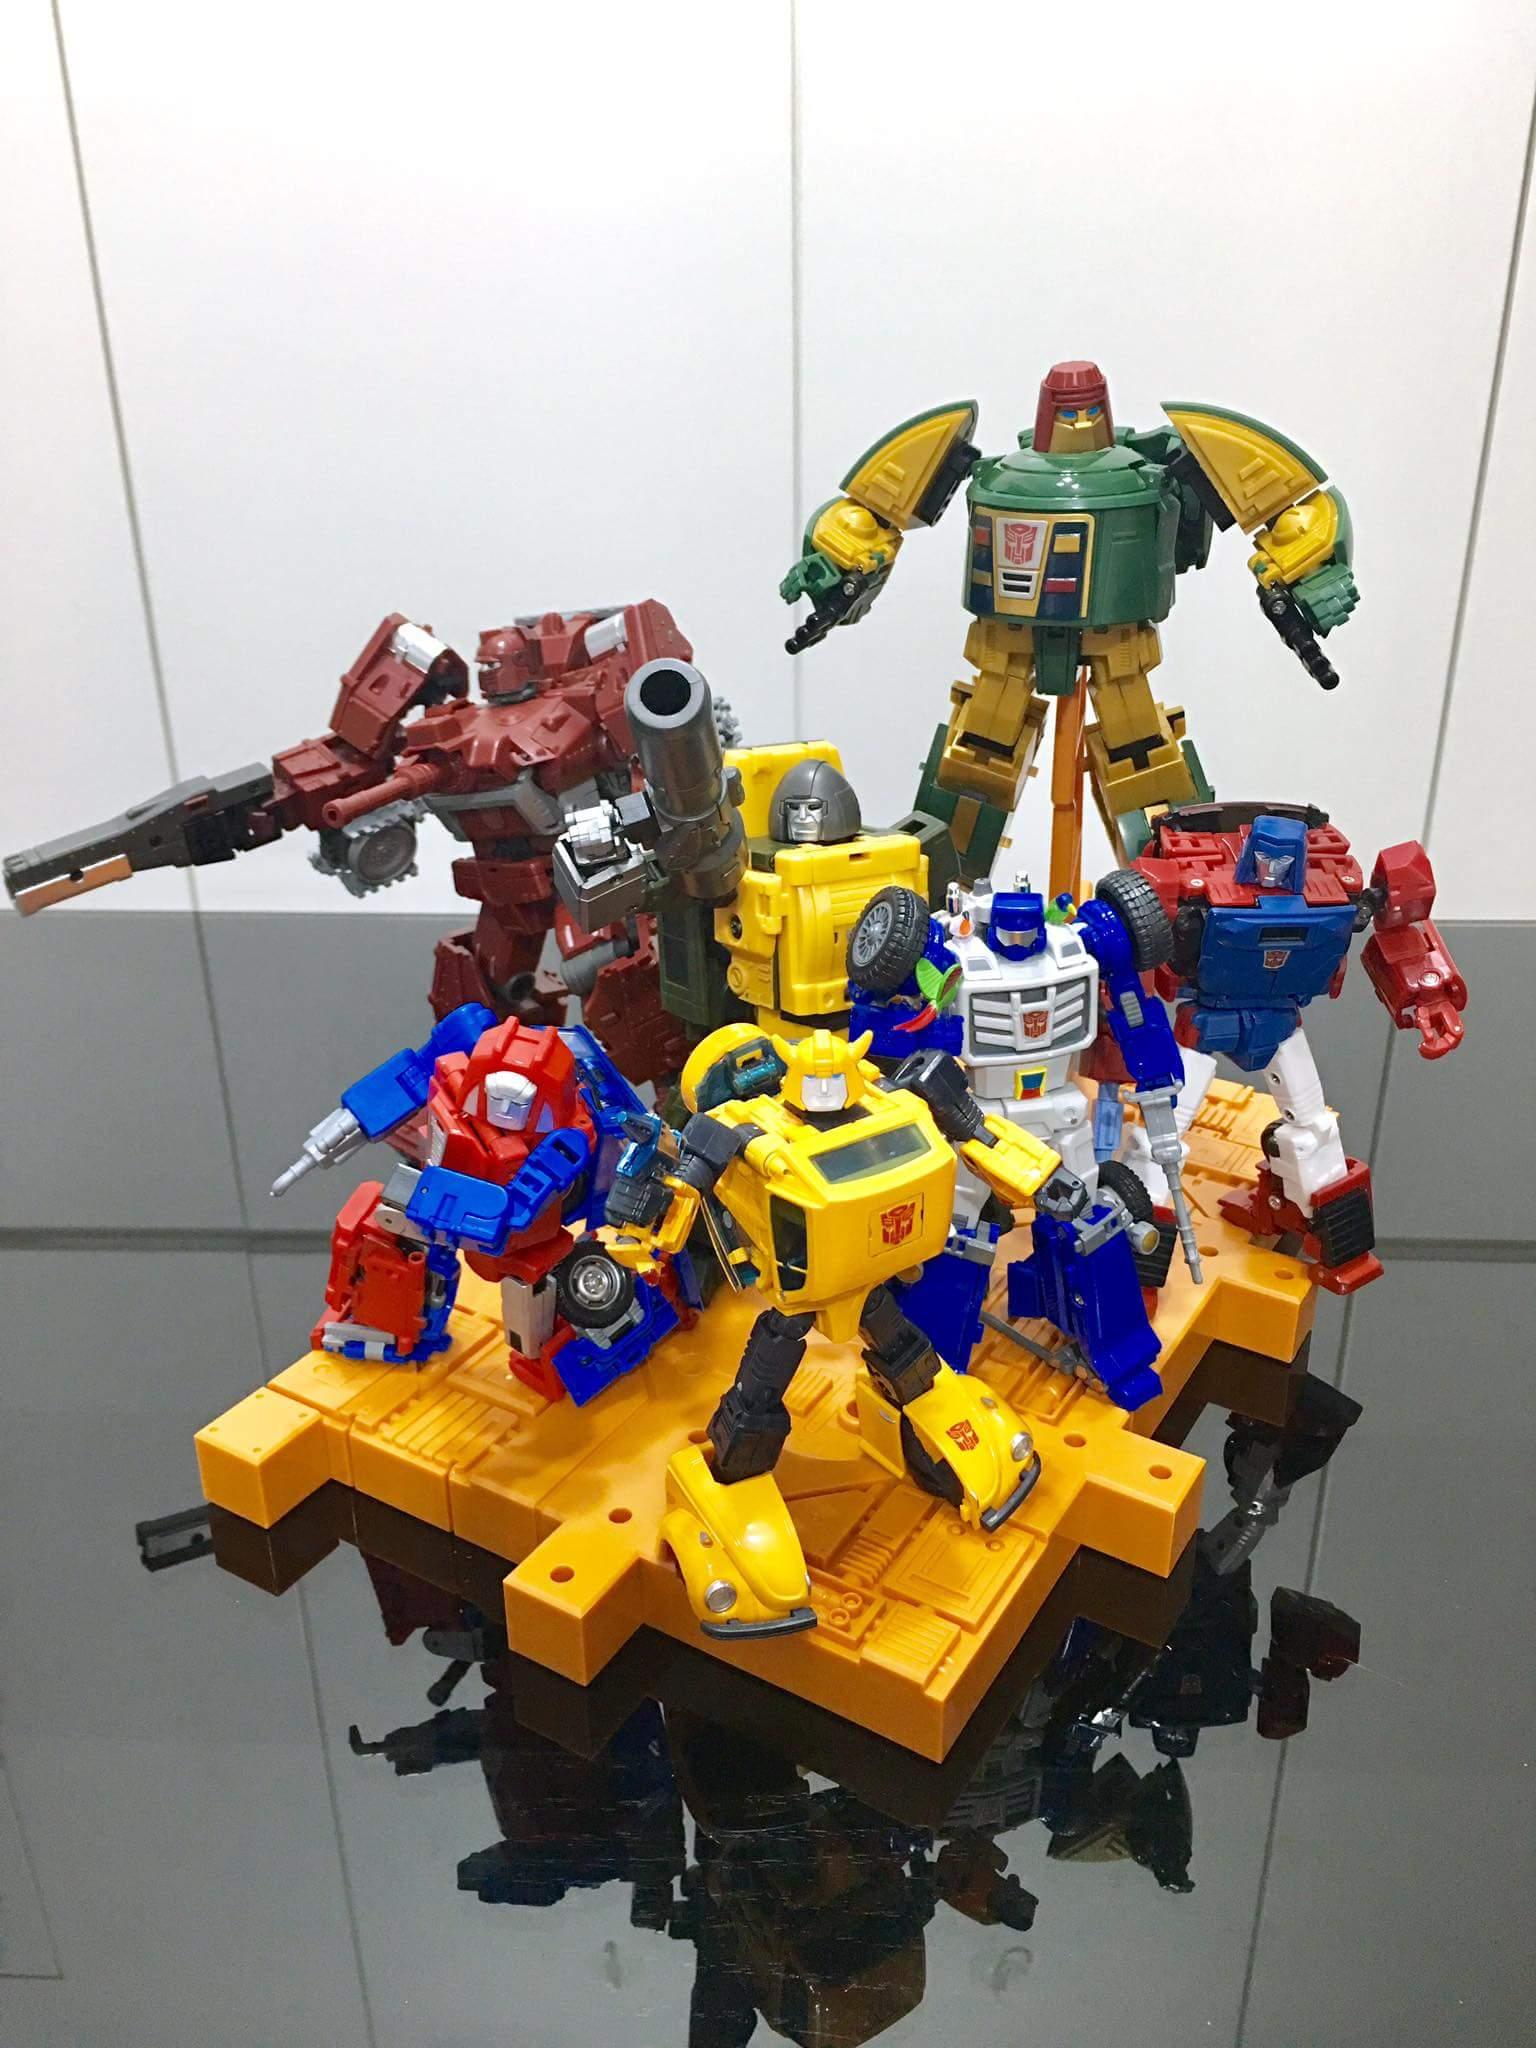 [Toyworld][Zeta Toys] Produit Tiers - Minibots MP - Gamme EX - Page 2 Czixzv9K